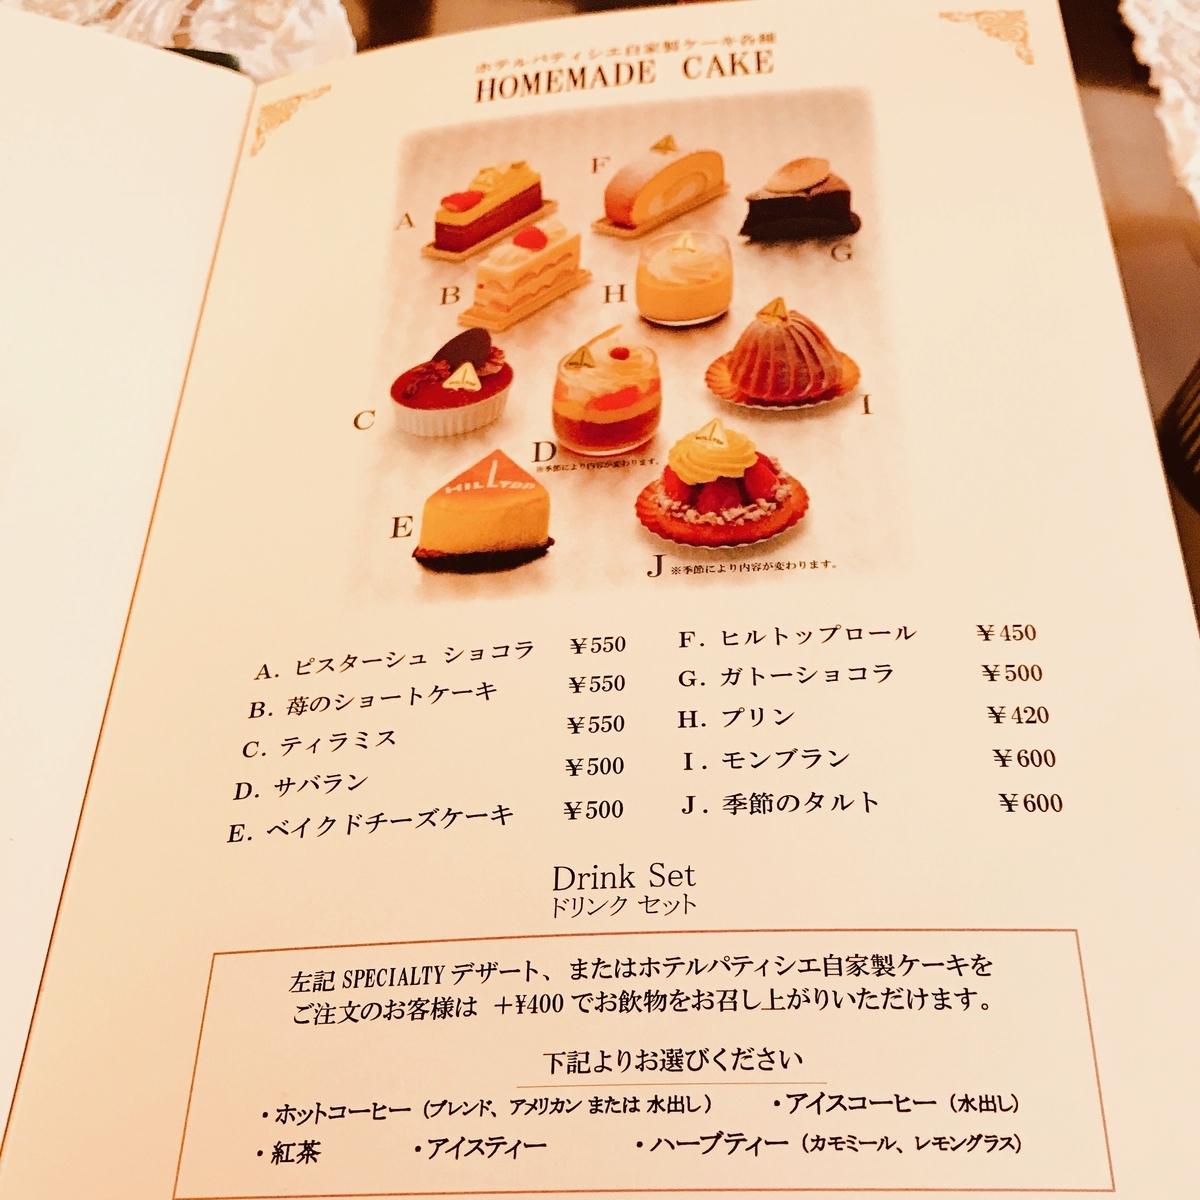 f:id:shufukatsu:20190504055733j:plain